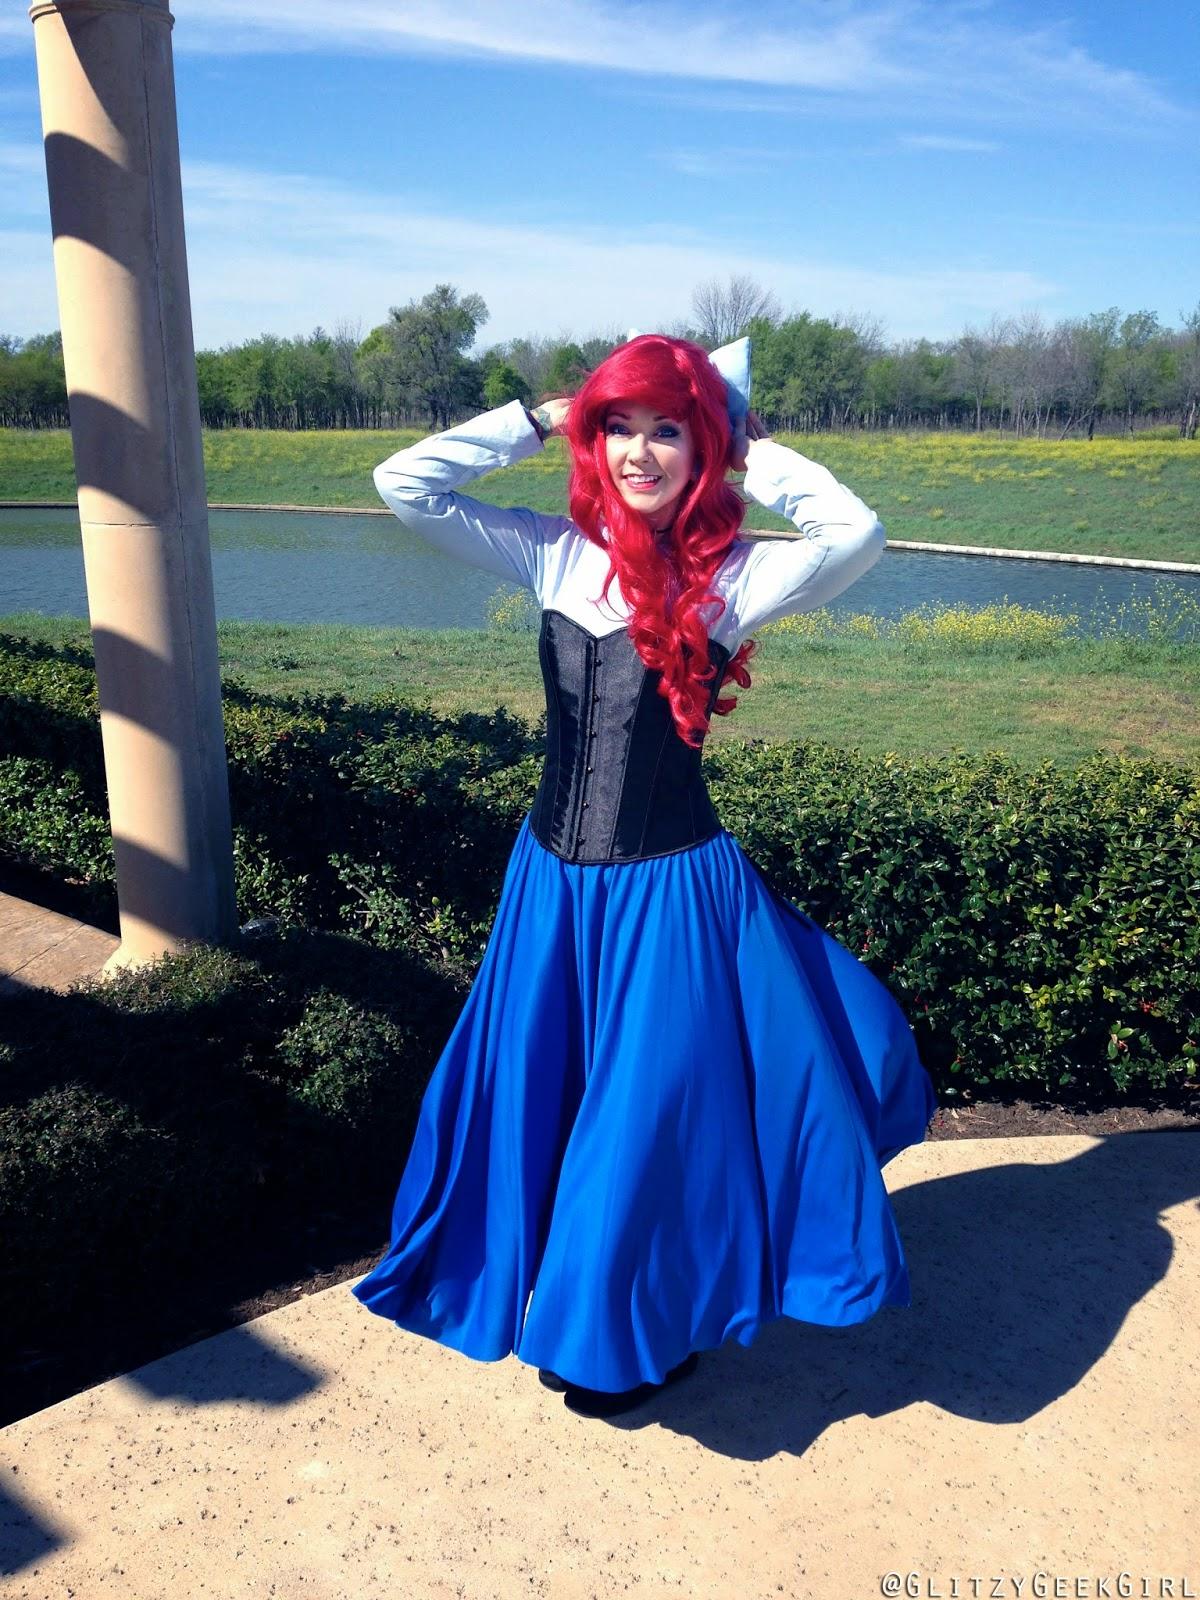 The dress ariel wore - Tutorial The Little Mermaid Ariel Cosplay